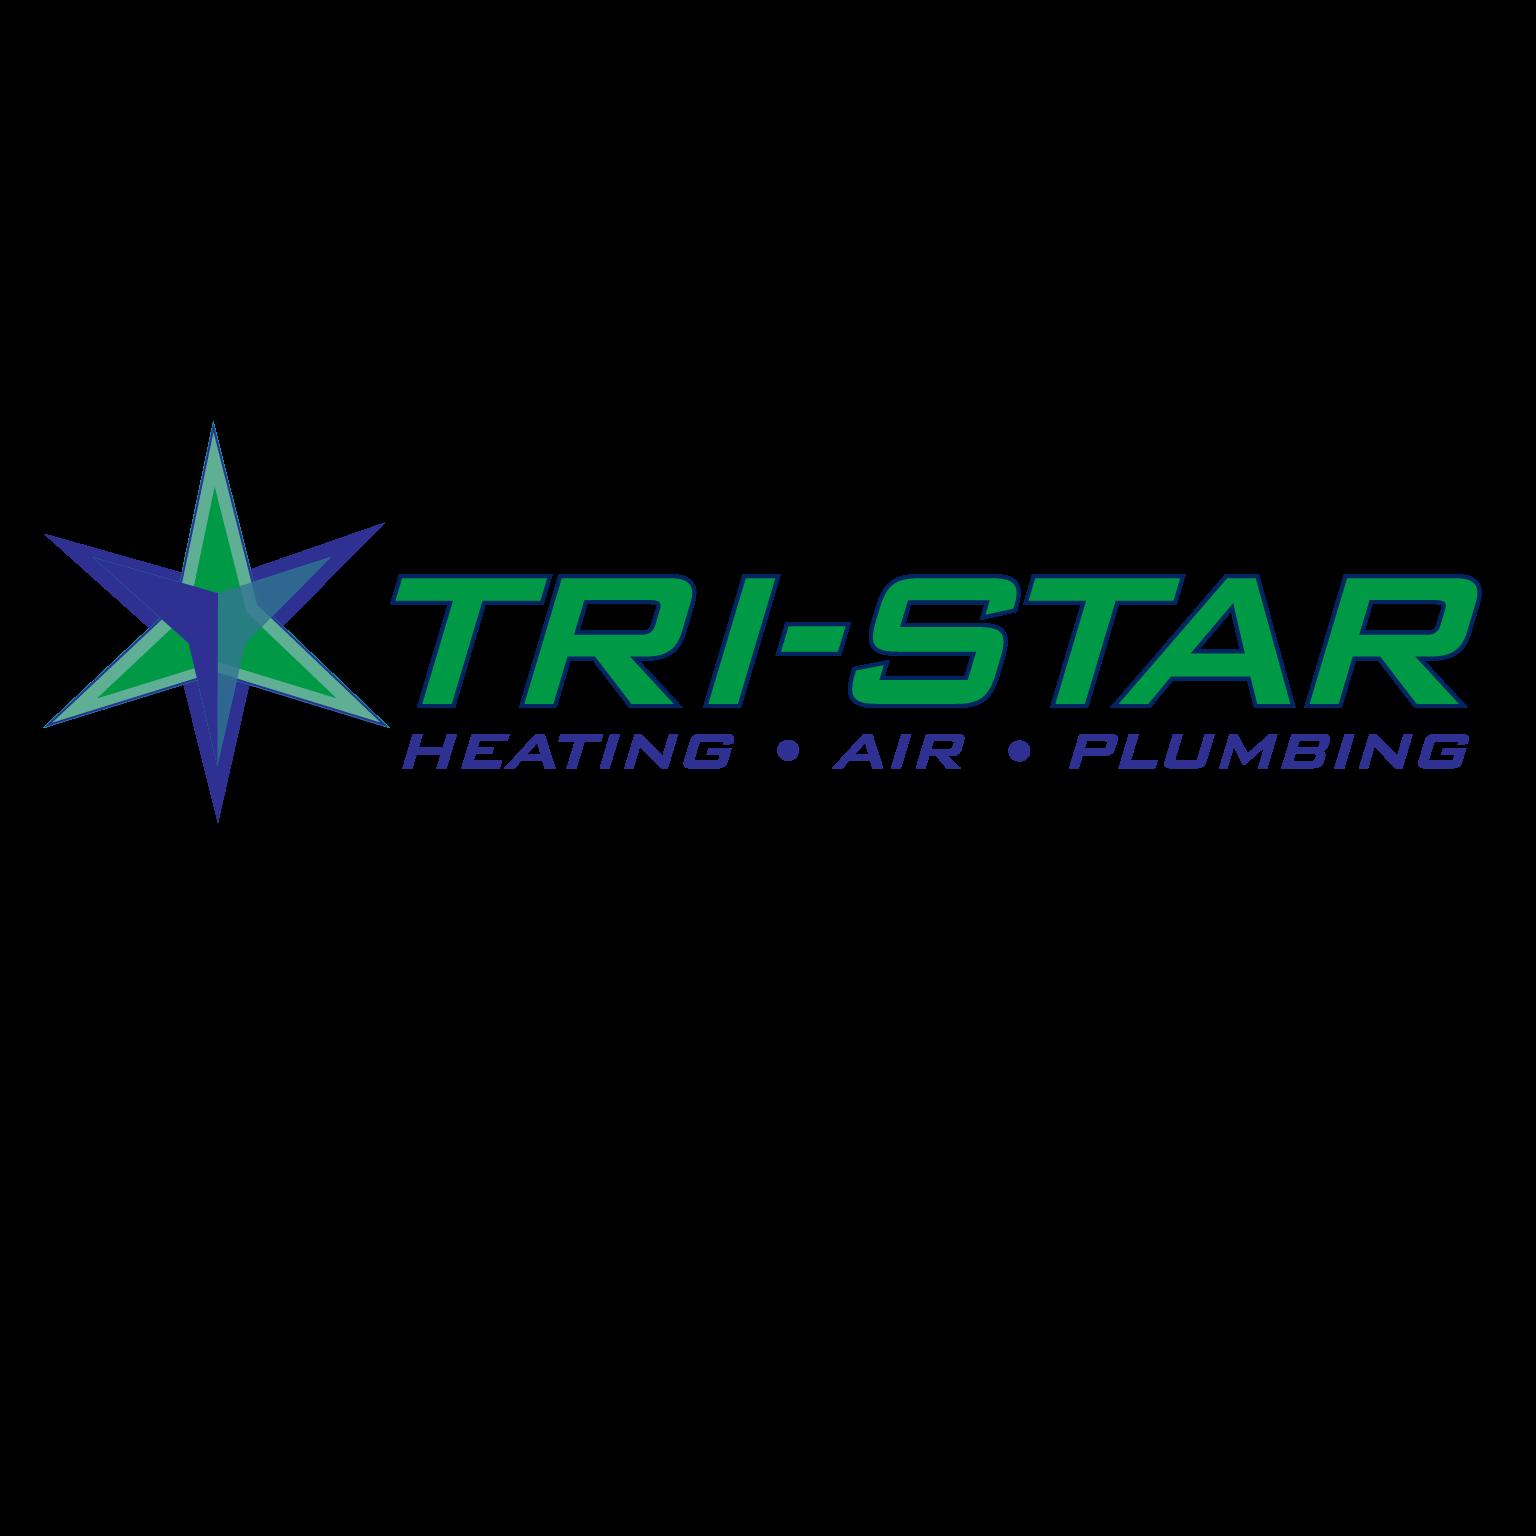 Tri-Star Heating Air & Plumbing